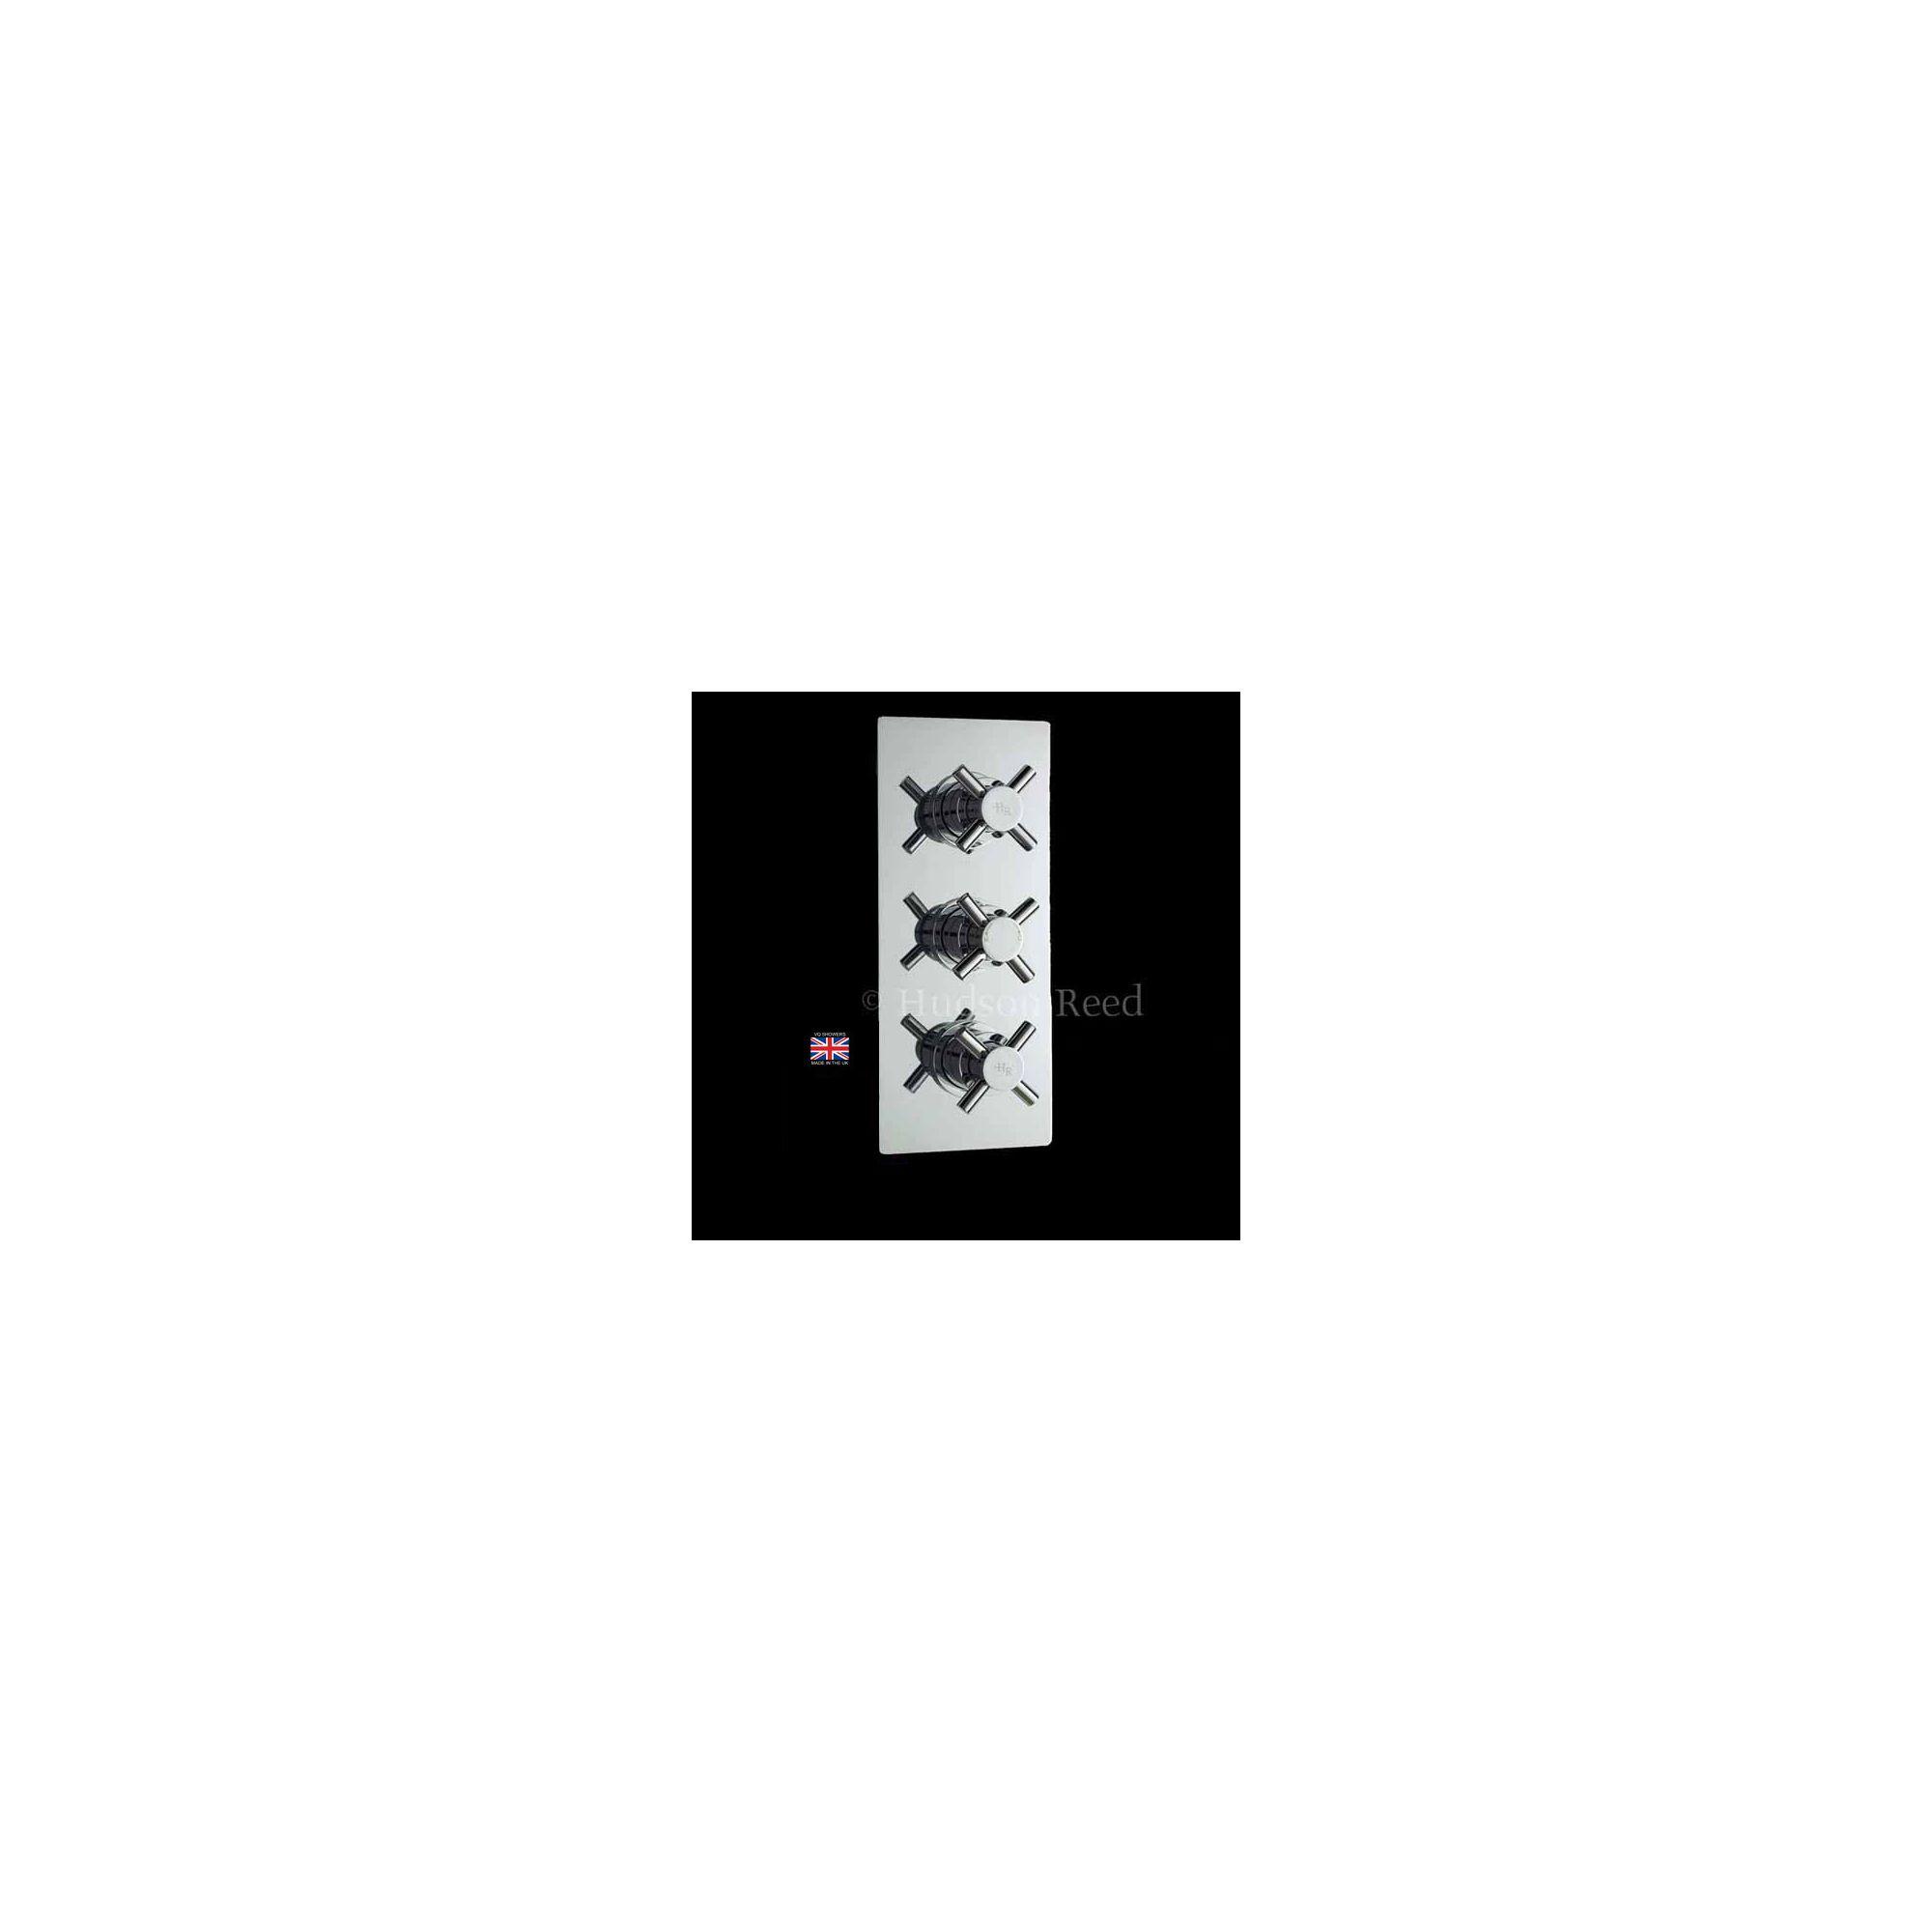 Hudson Reed Kristal Triple Concealed Thermostatic Shower Valve with Diverter at Tesco Direct